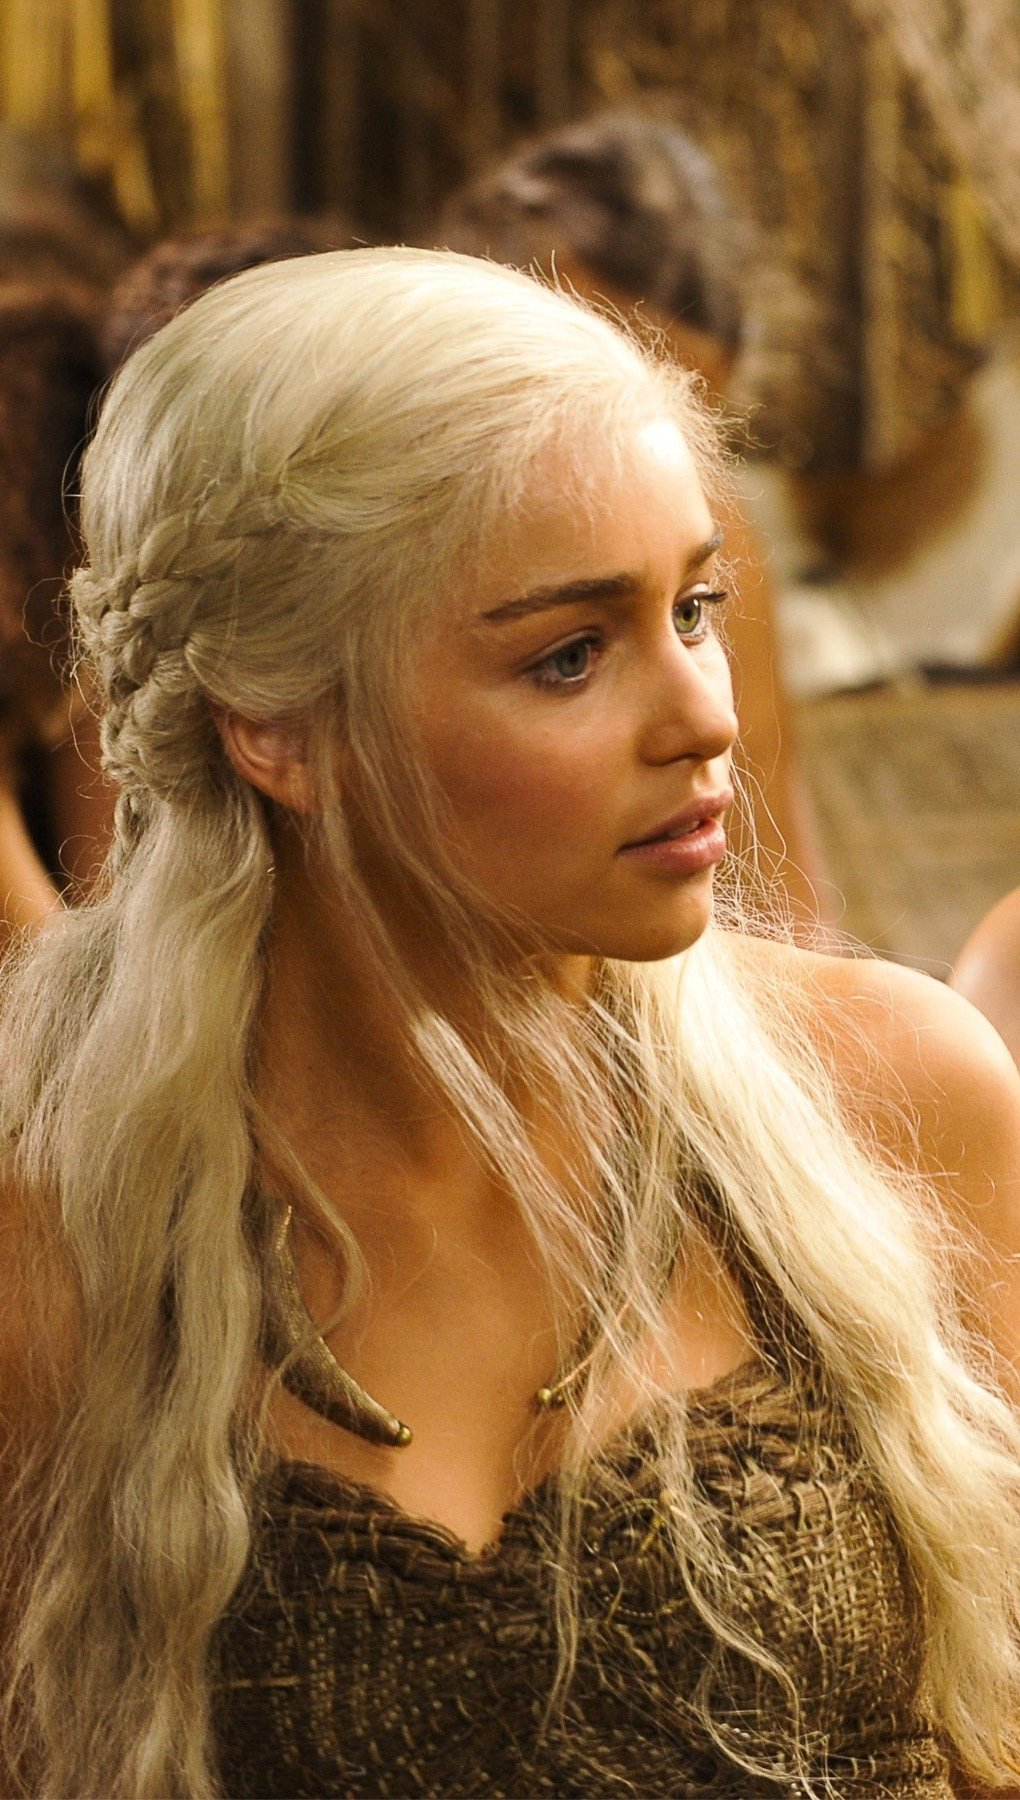 Fondos de pantalla Daenerys targaryen en la primera temporada Vertical